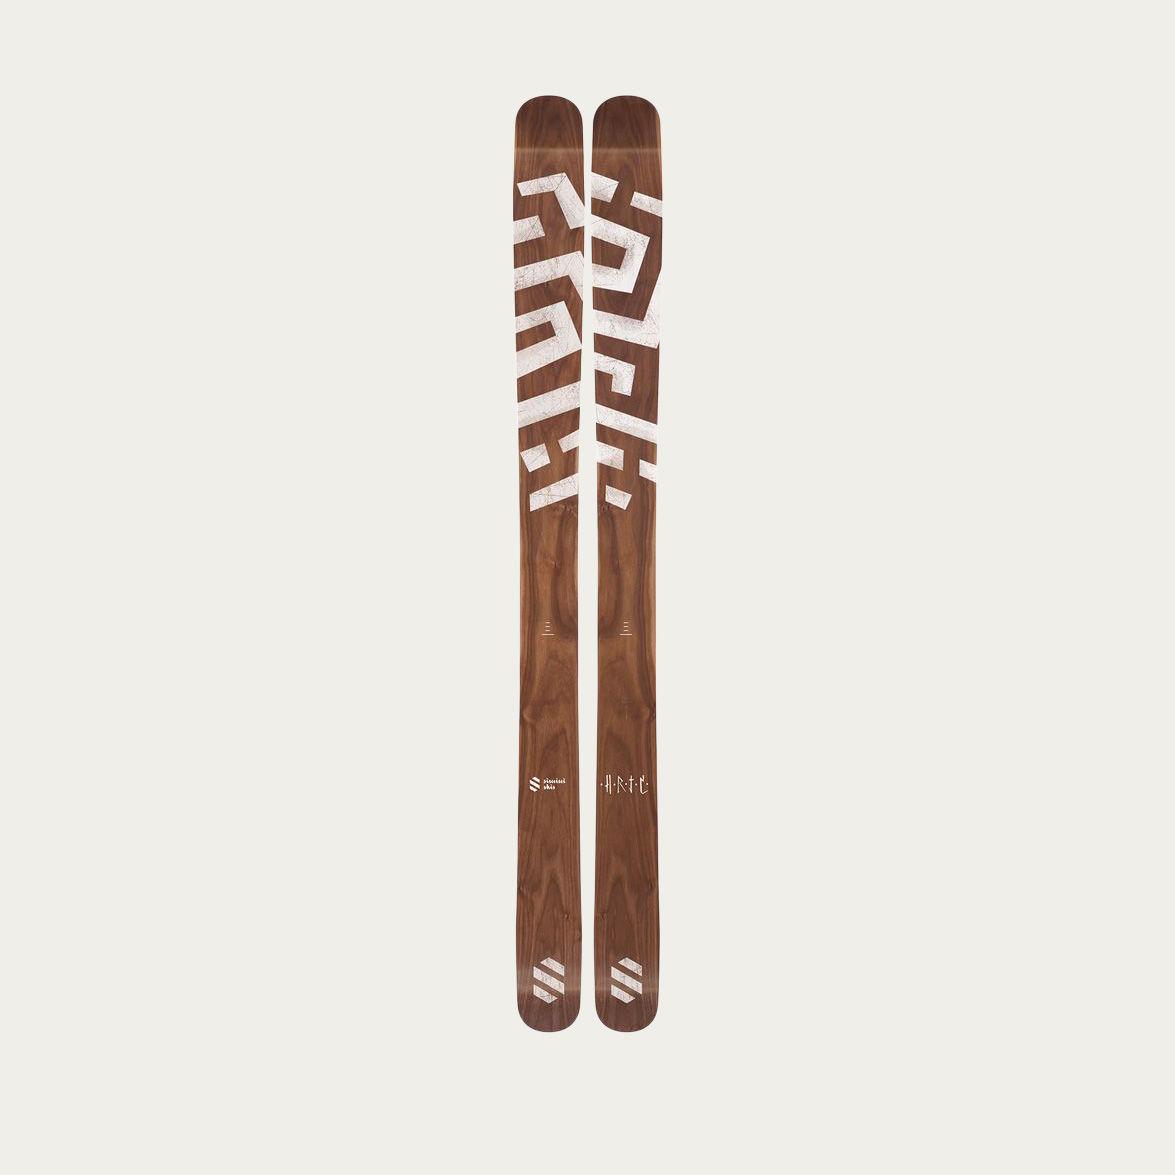 African Nut Simini Skis HRTC | Bombinate